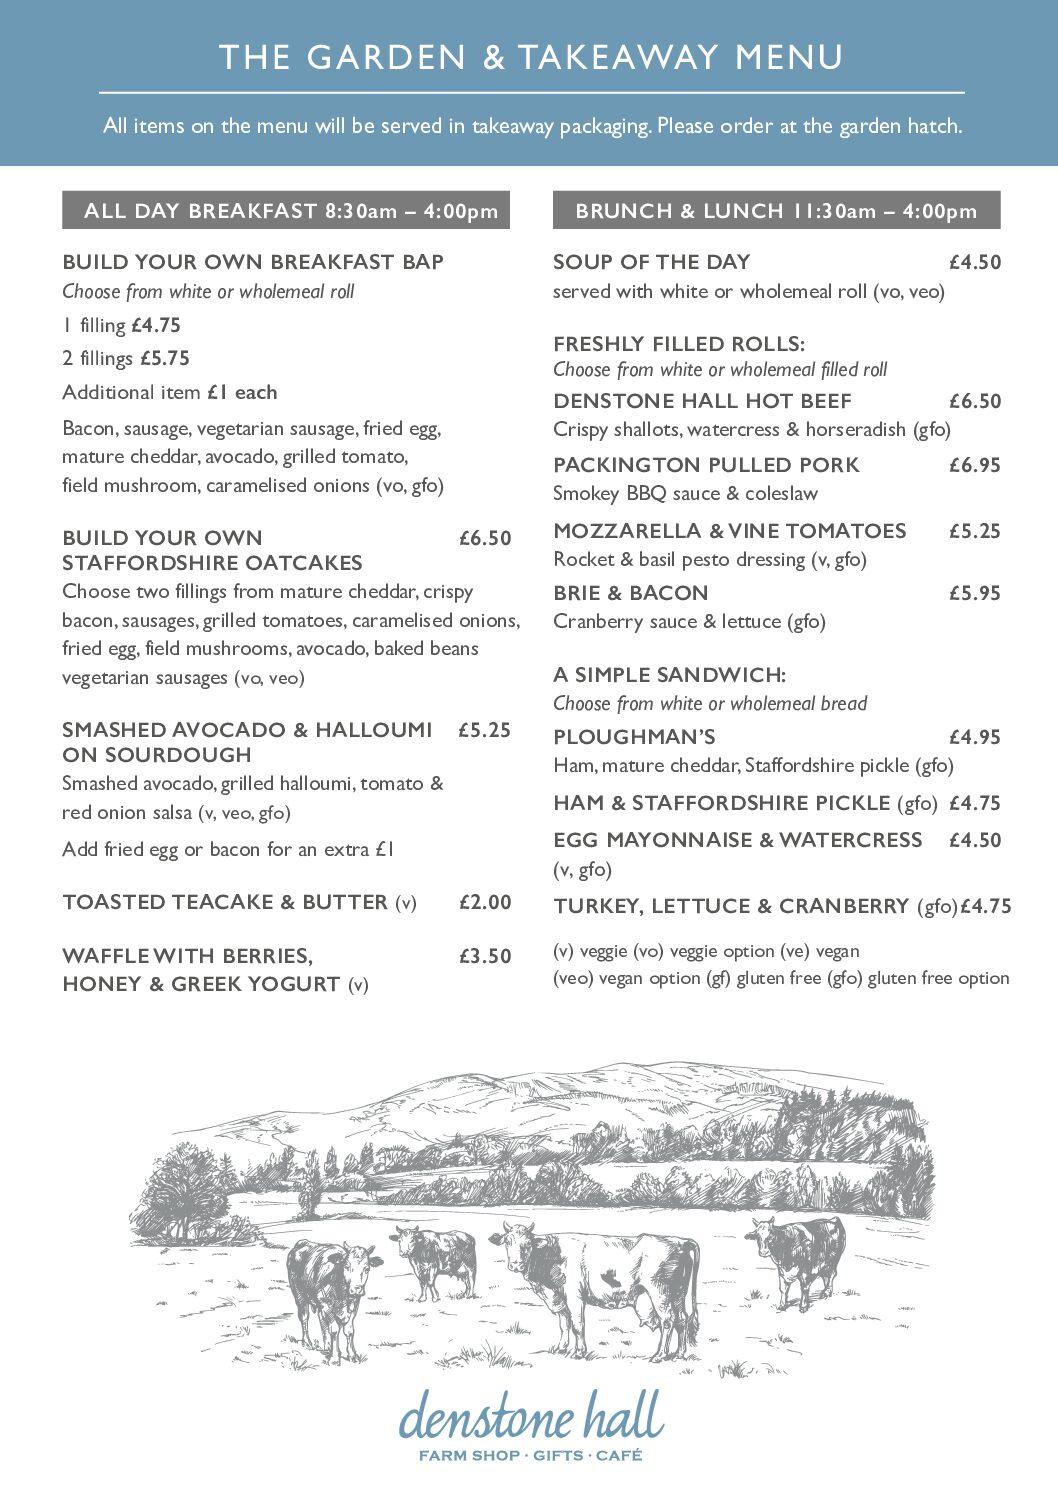 Denstone Hall Farm Shop & Café - Breakfast & Brunch Menu